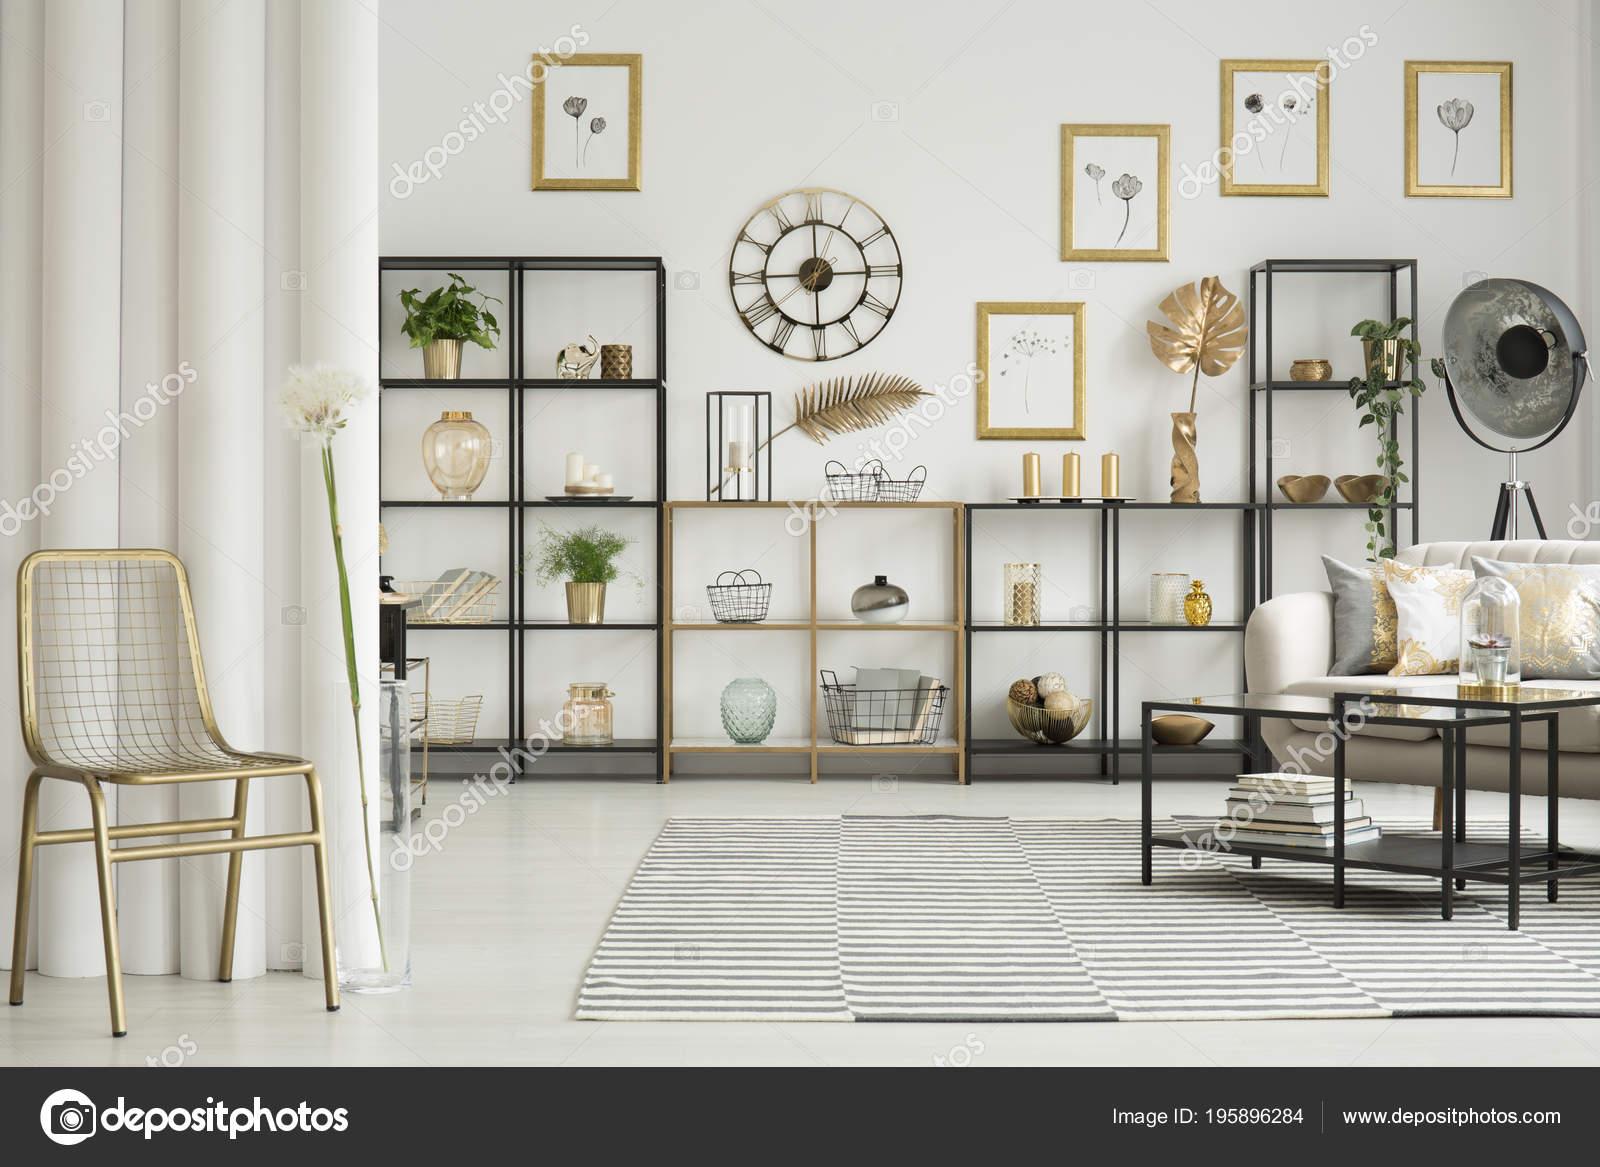 Gouden Stoel Paardebloem Elegant Woonkamer Interieur Met Tekeningen ...